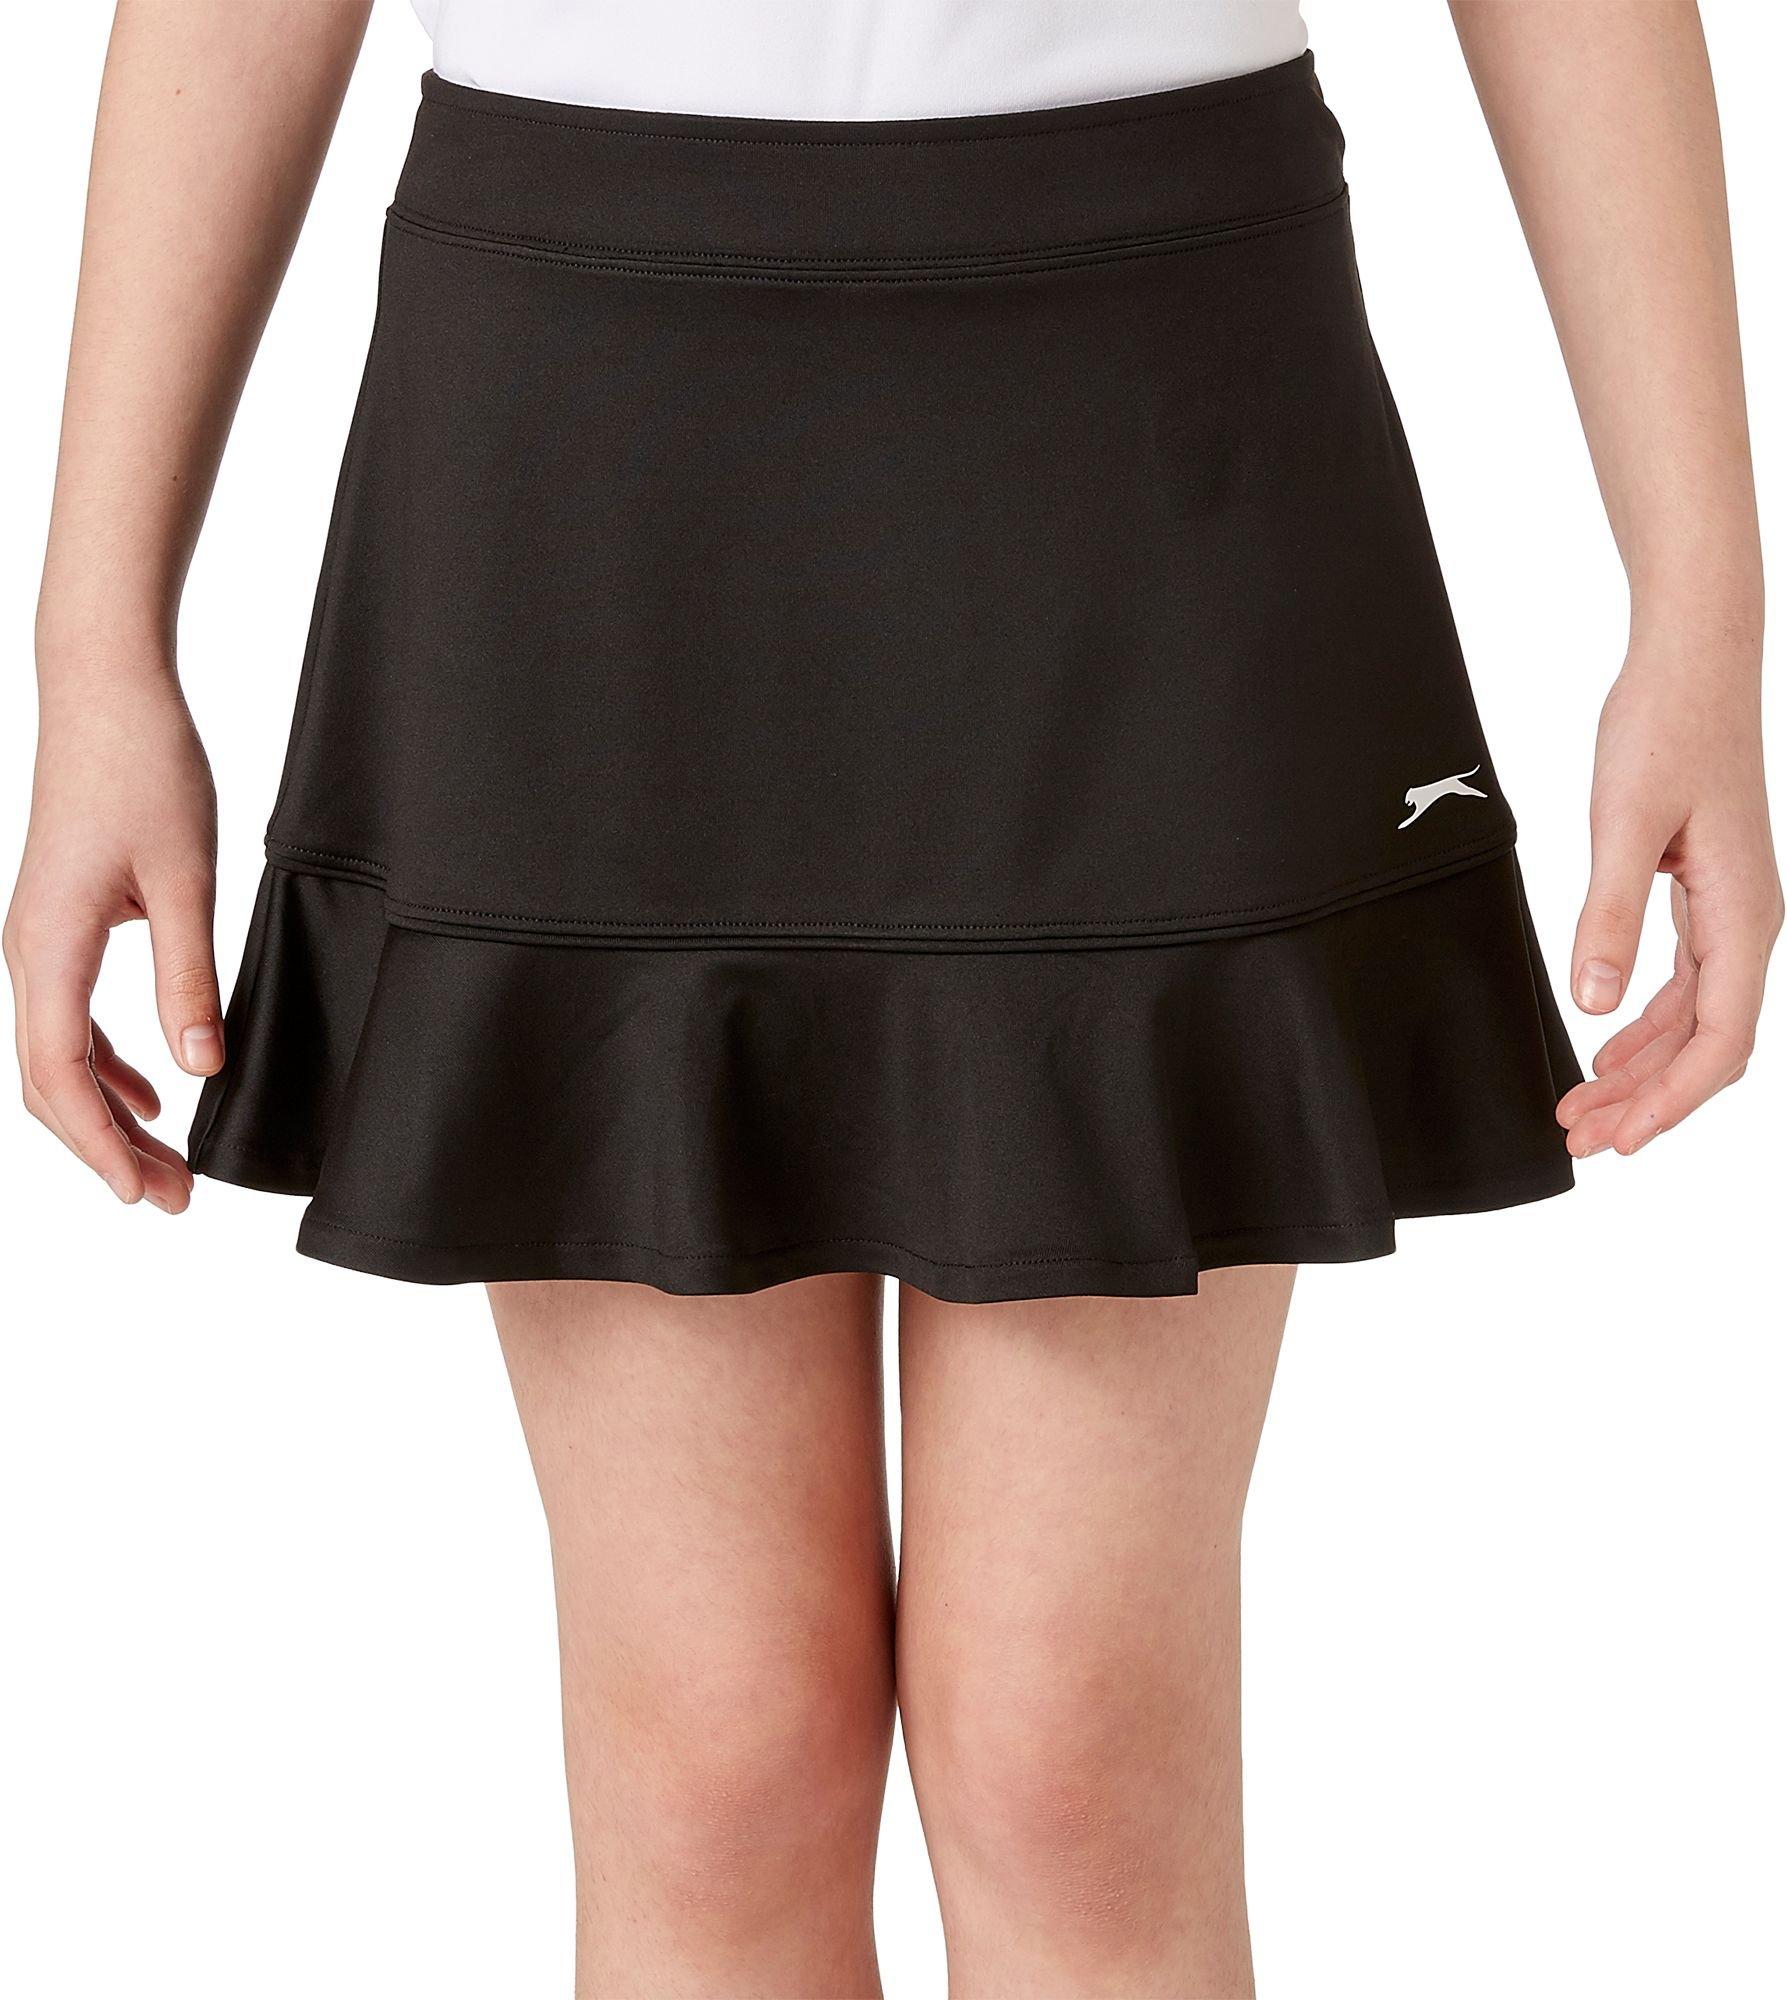 Slazenger Girl's Ruffle Knit Golf Skort (Black, Medium)